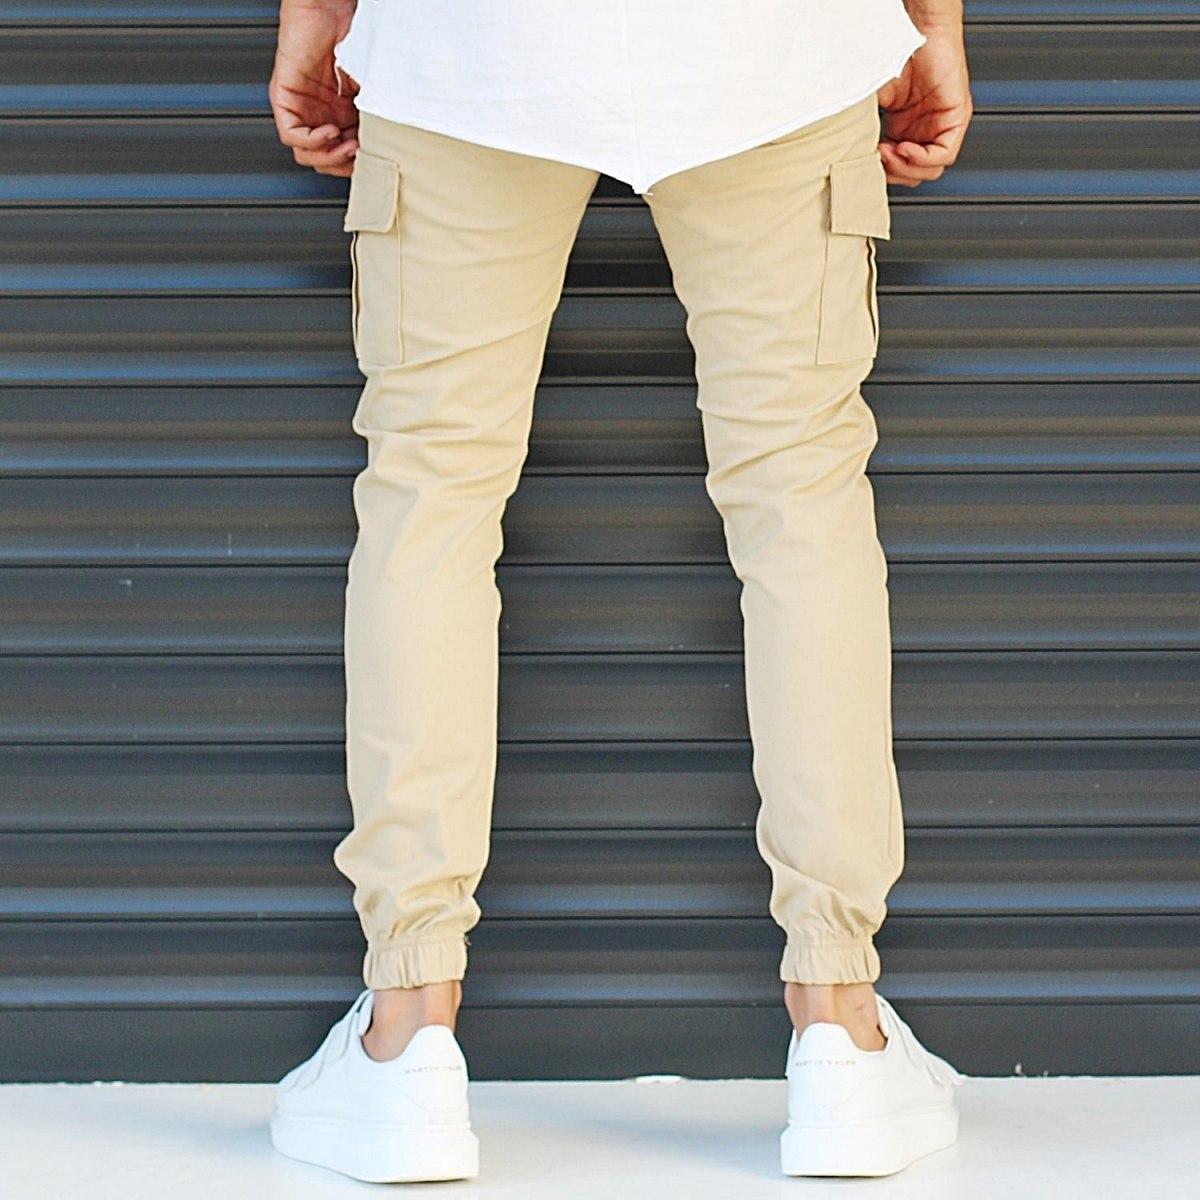 Men's Sport Pants With Side Pockets Beige Mv Premium Brand - 4